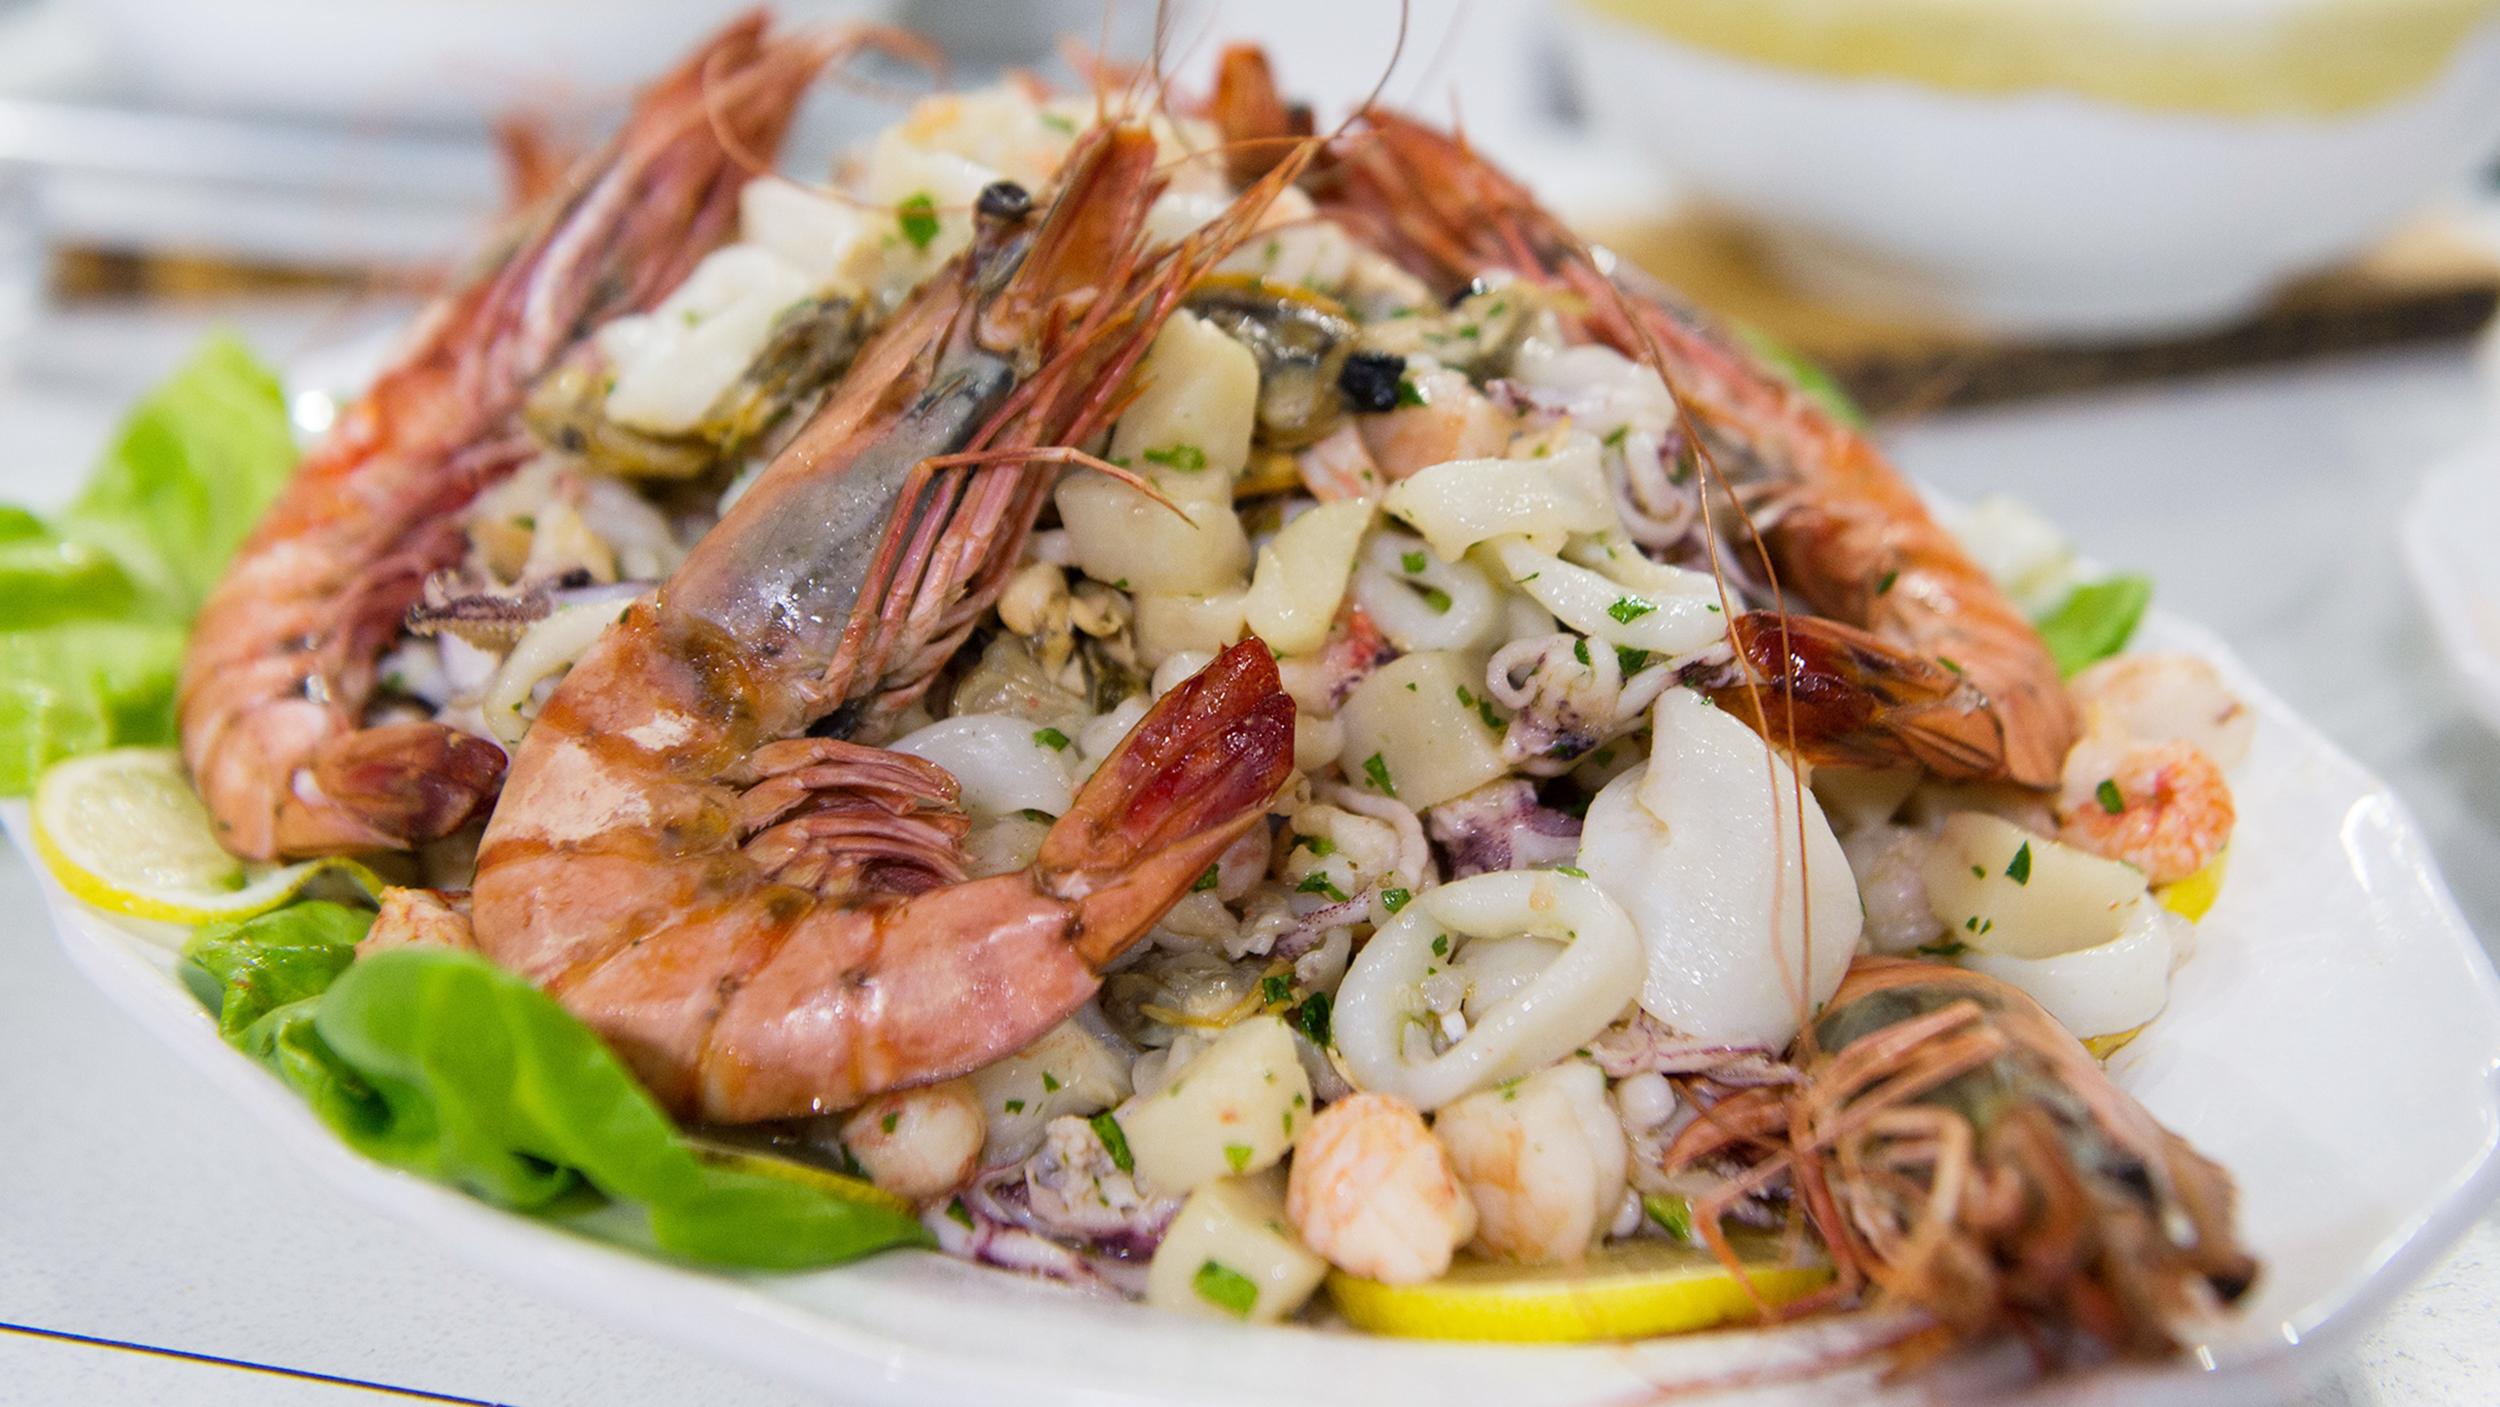 Italian Seafood Salad (Insalata di Mare) - TODAY.com